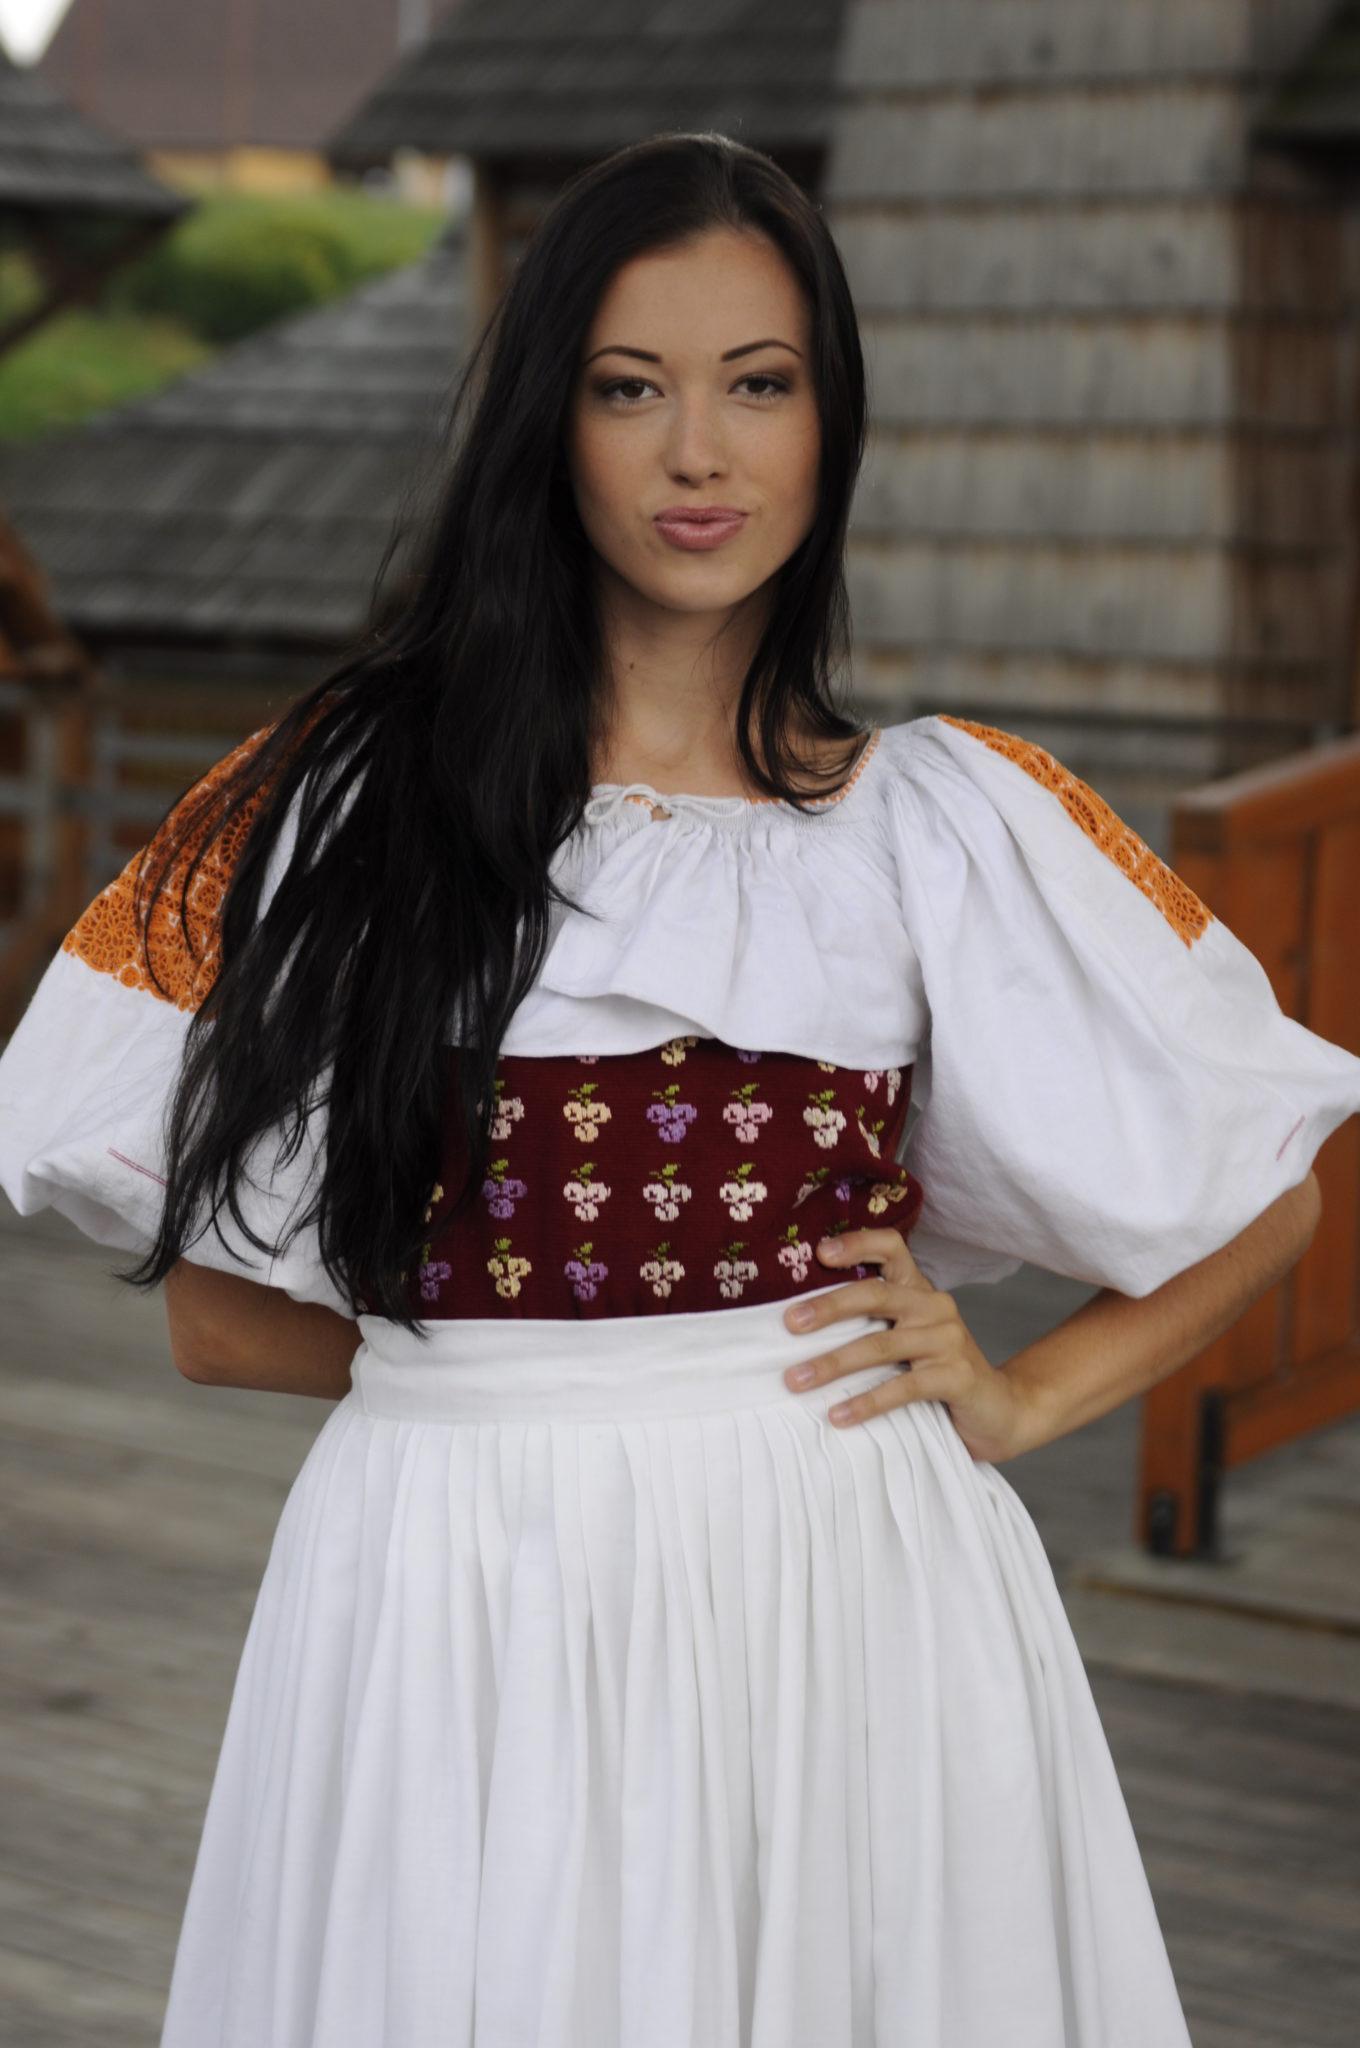 miss_folklor_2015_vychodna_mmagazin4